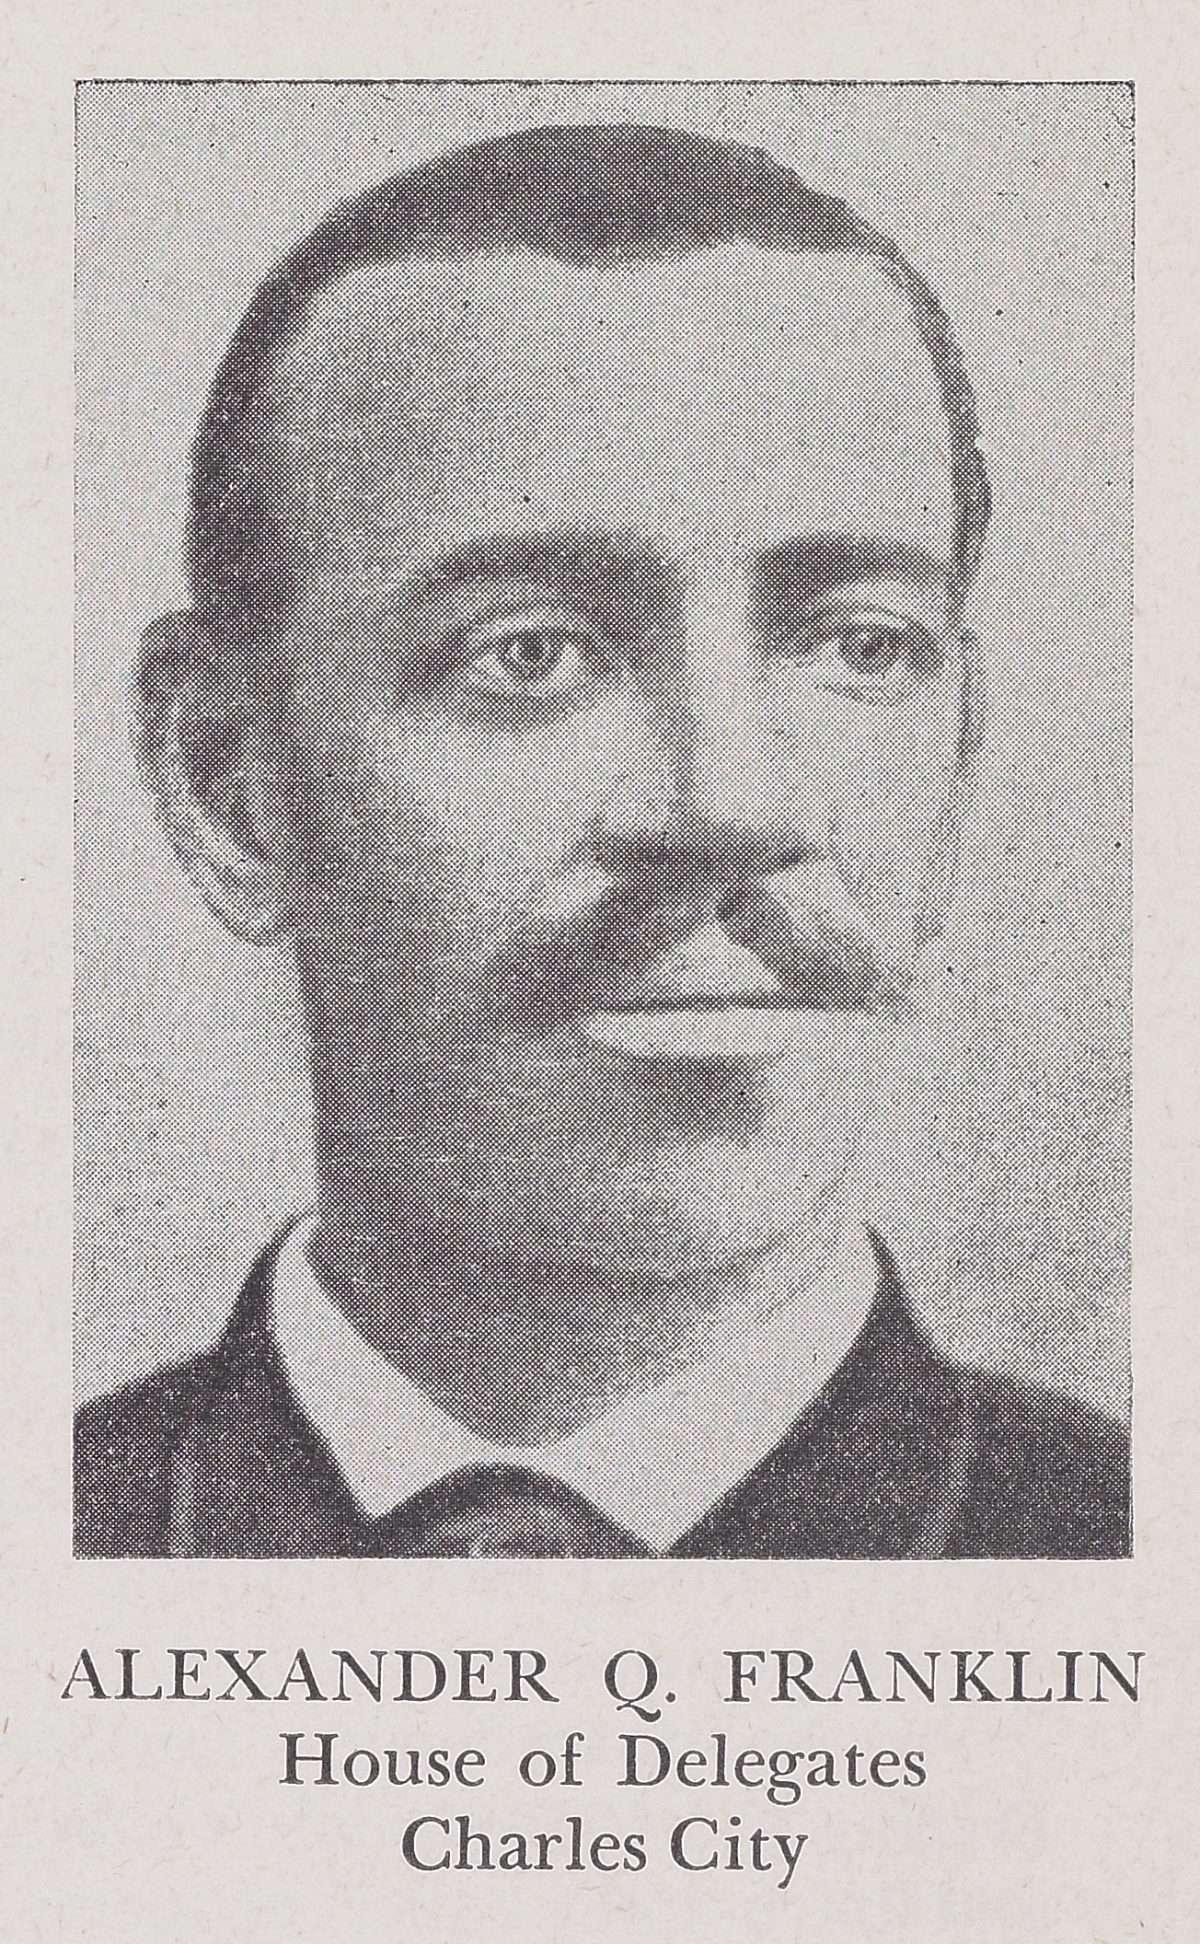 A. Q. Franklin